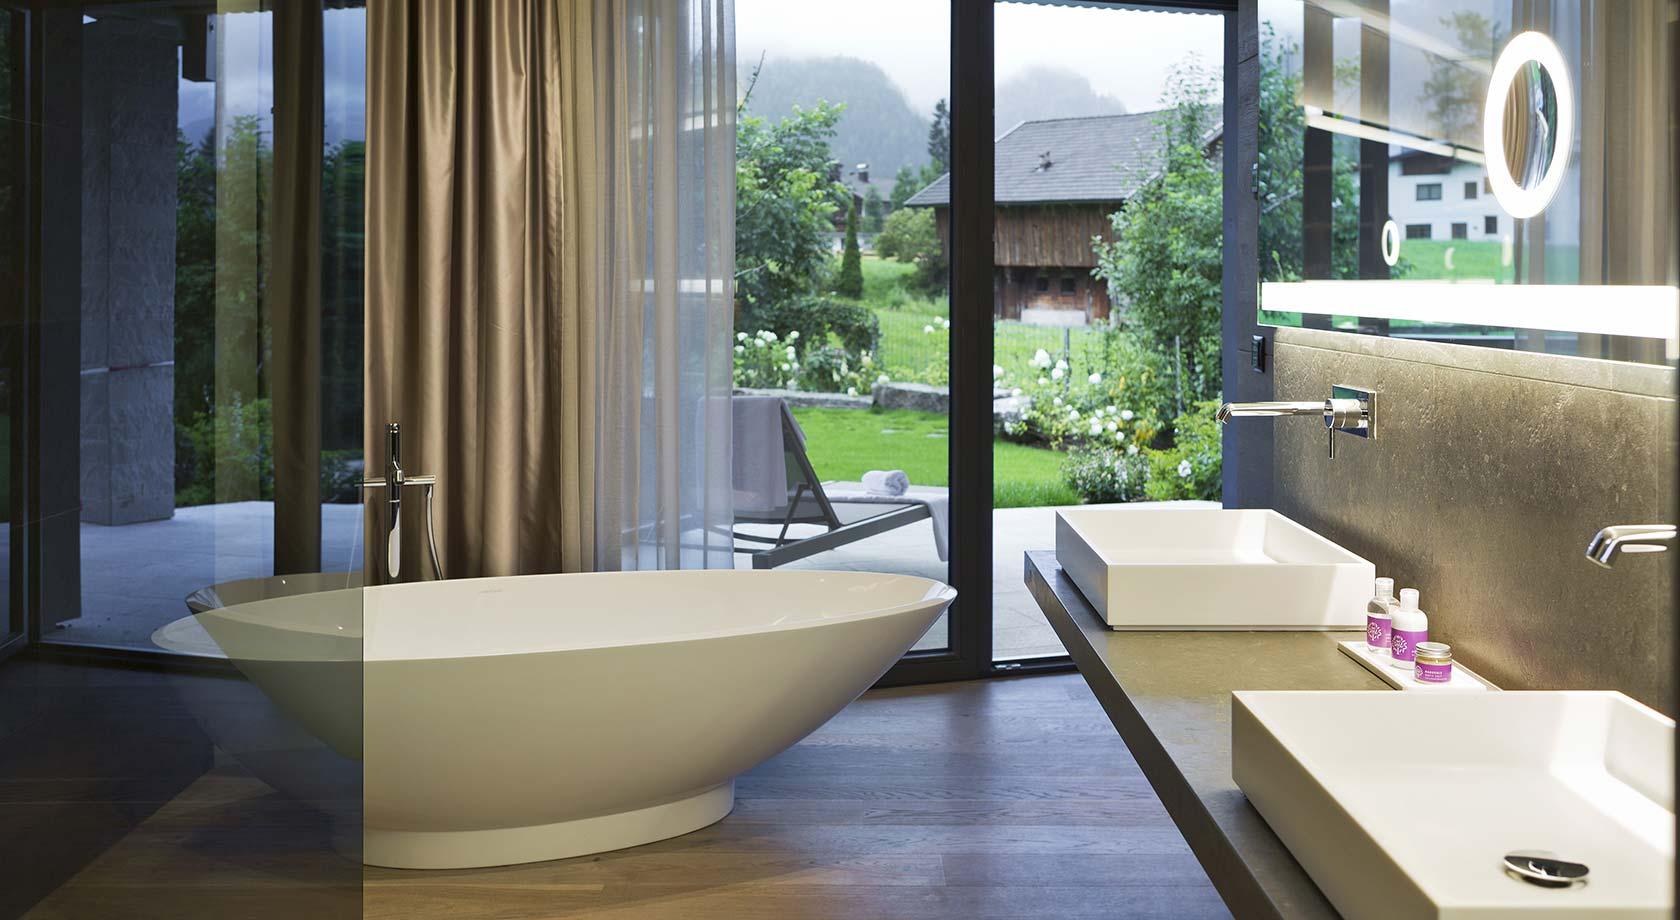 Vasche da bagno in corian rivestite in pietra arredo - Vasche da bagno su misura ...